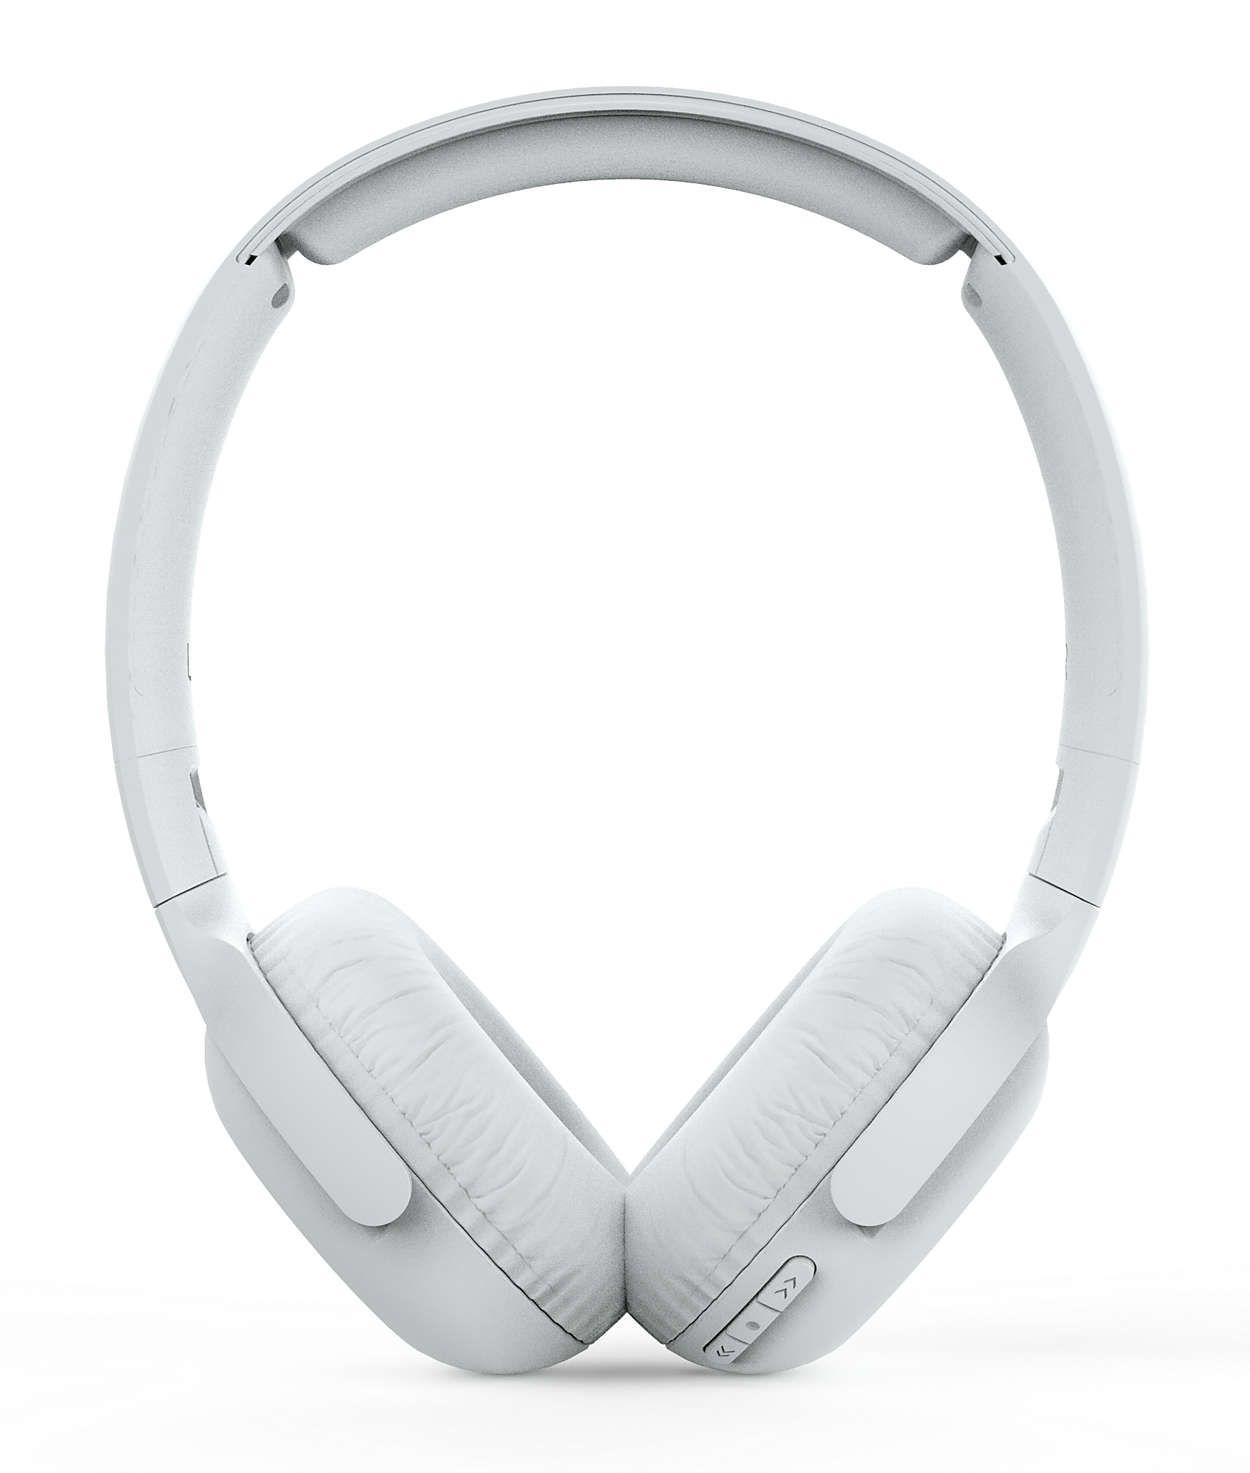 Fone de Ouvido Bluetooth Philips TAUH202WT/00 - Branco